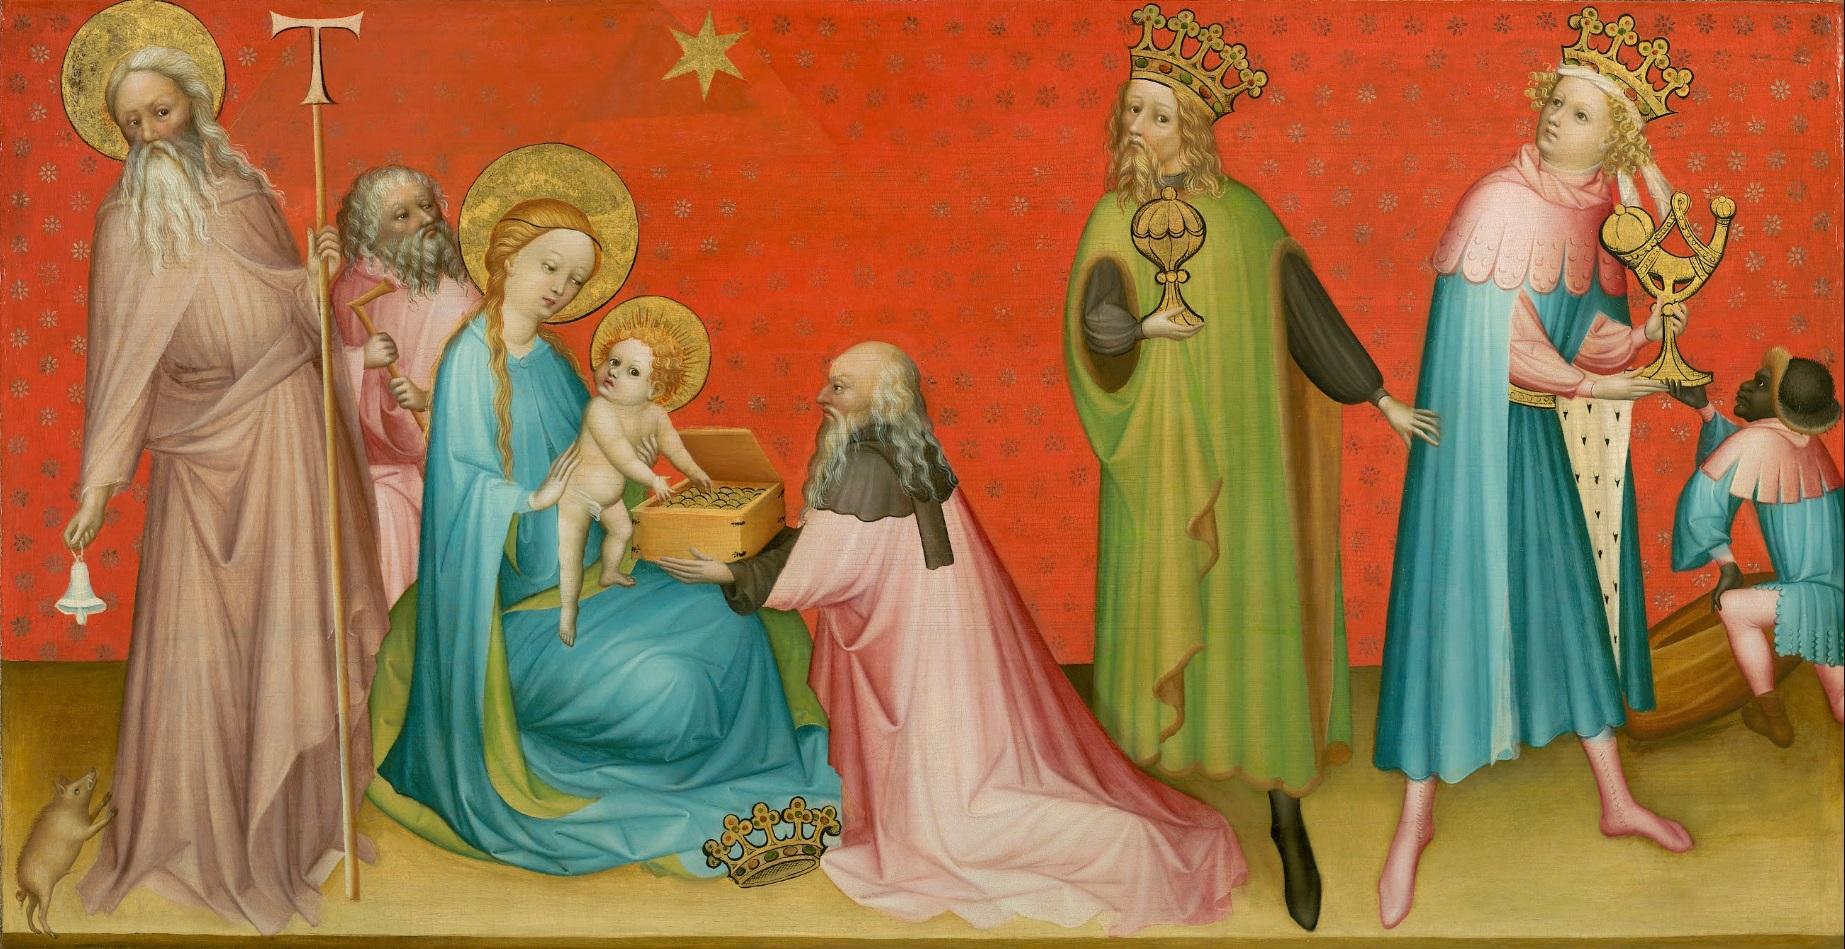 1390-flemish-master-1390.jpg